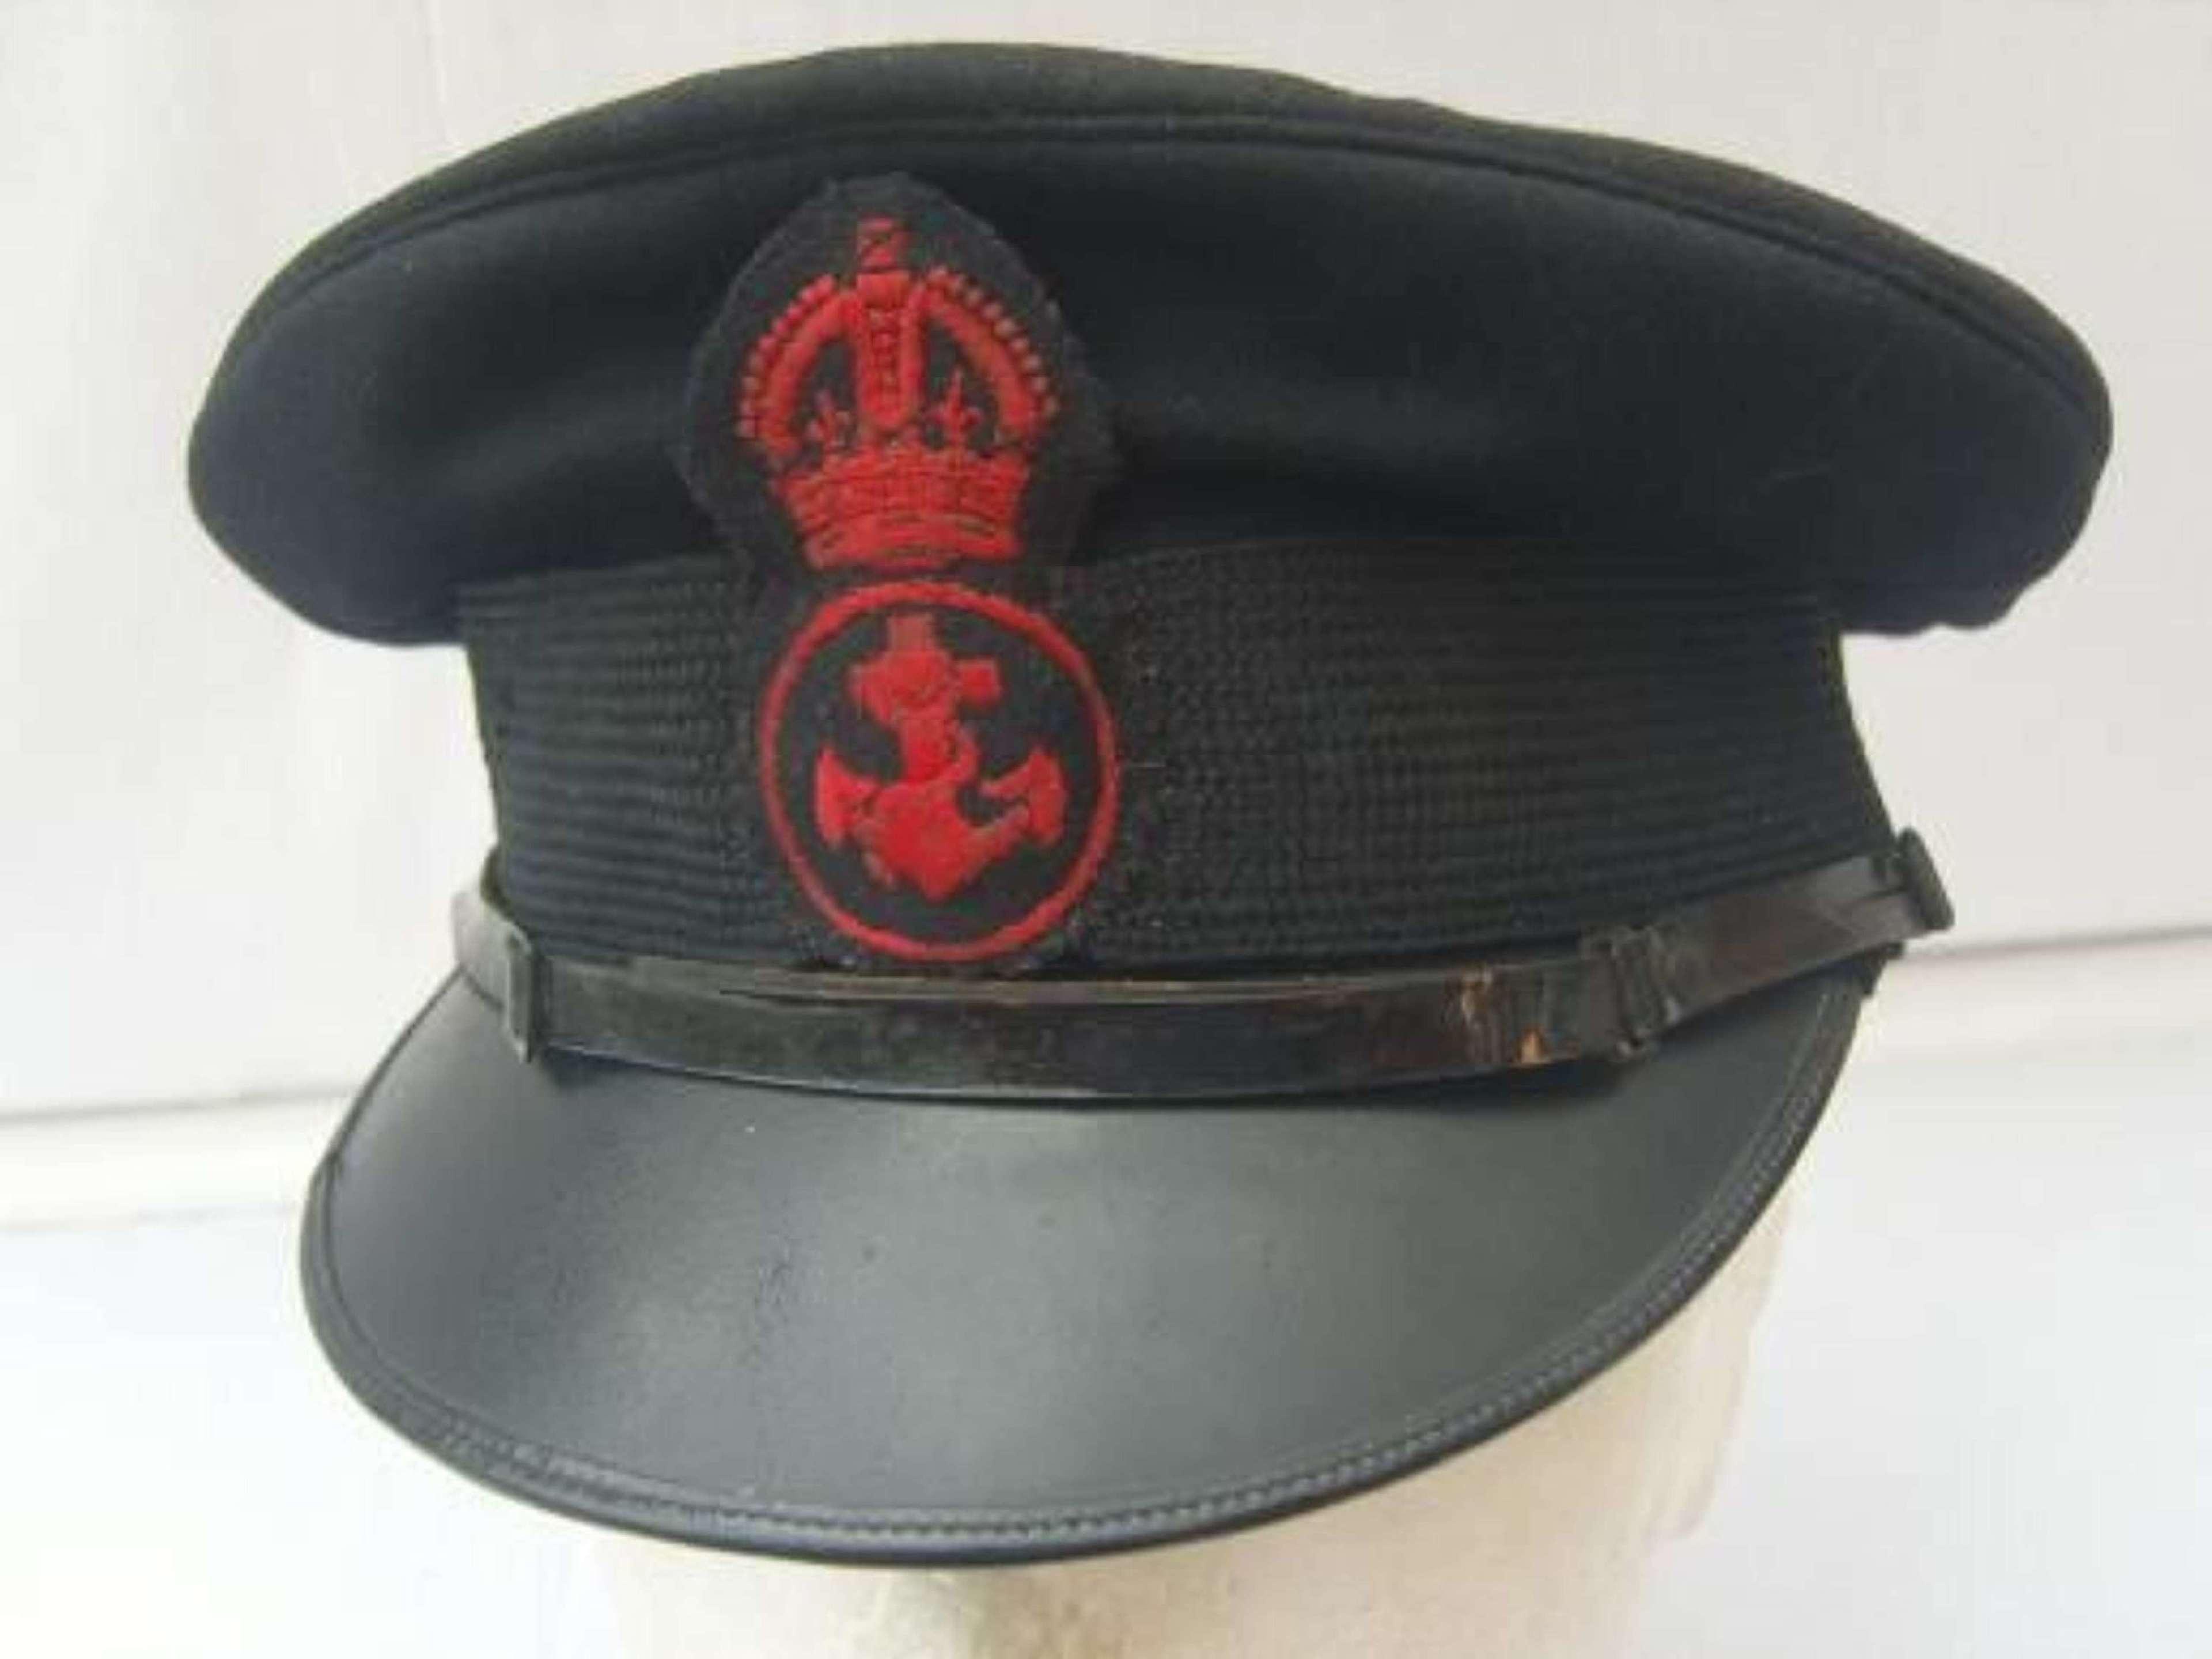 ROYAL NAVY PETTY OFFICERS PEAK CAP